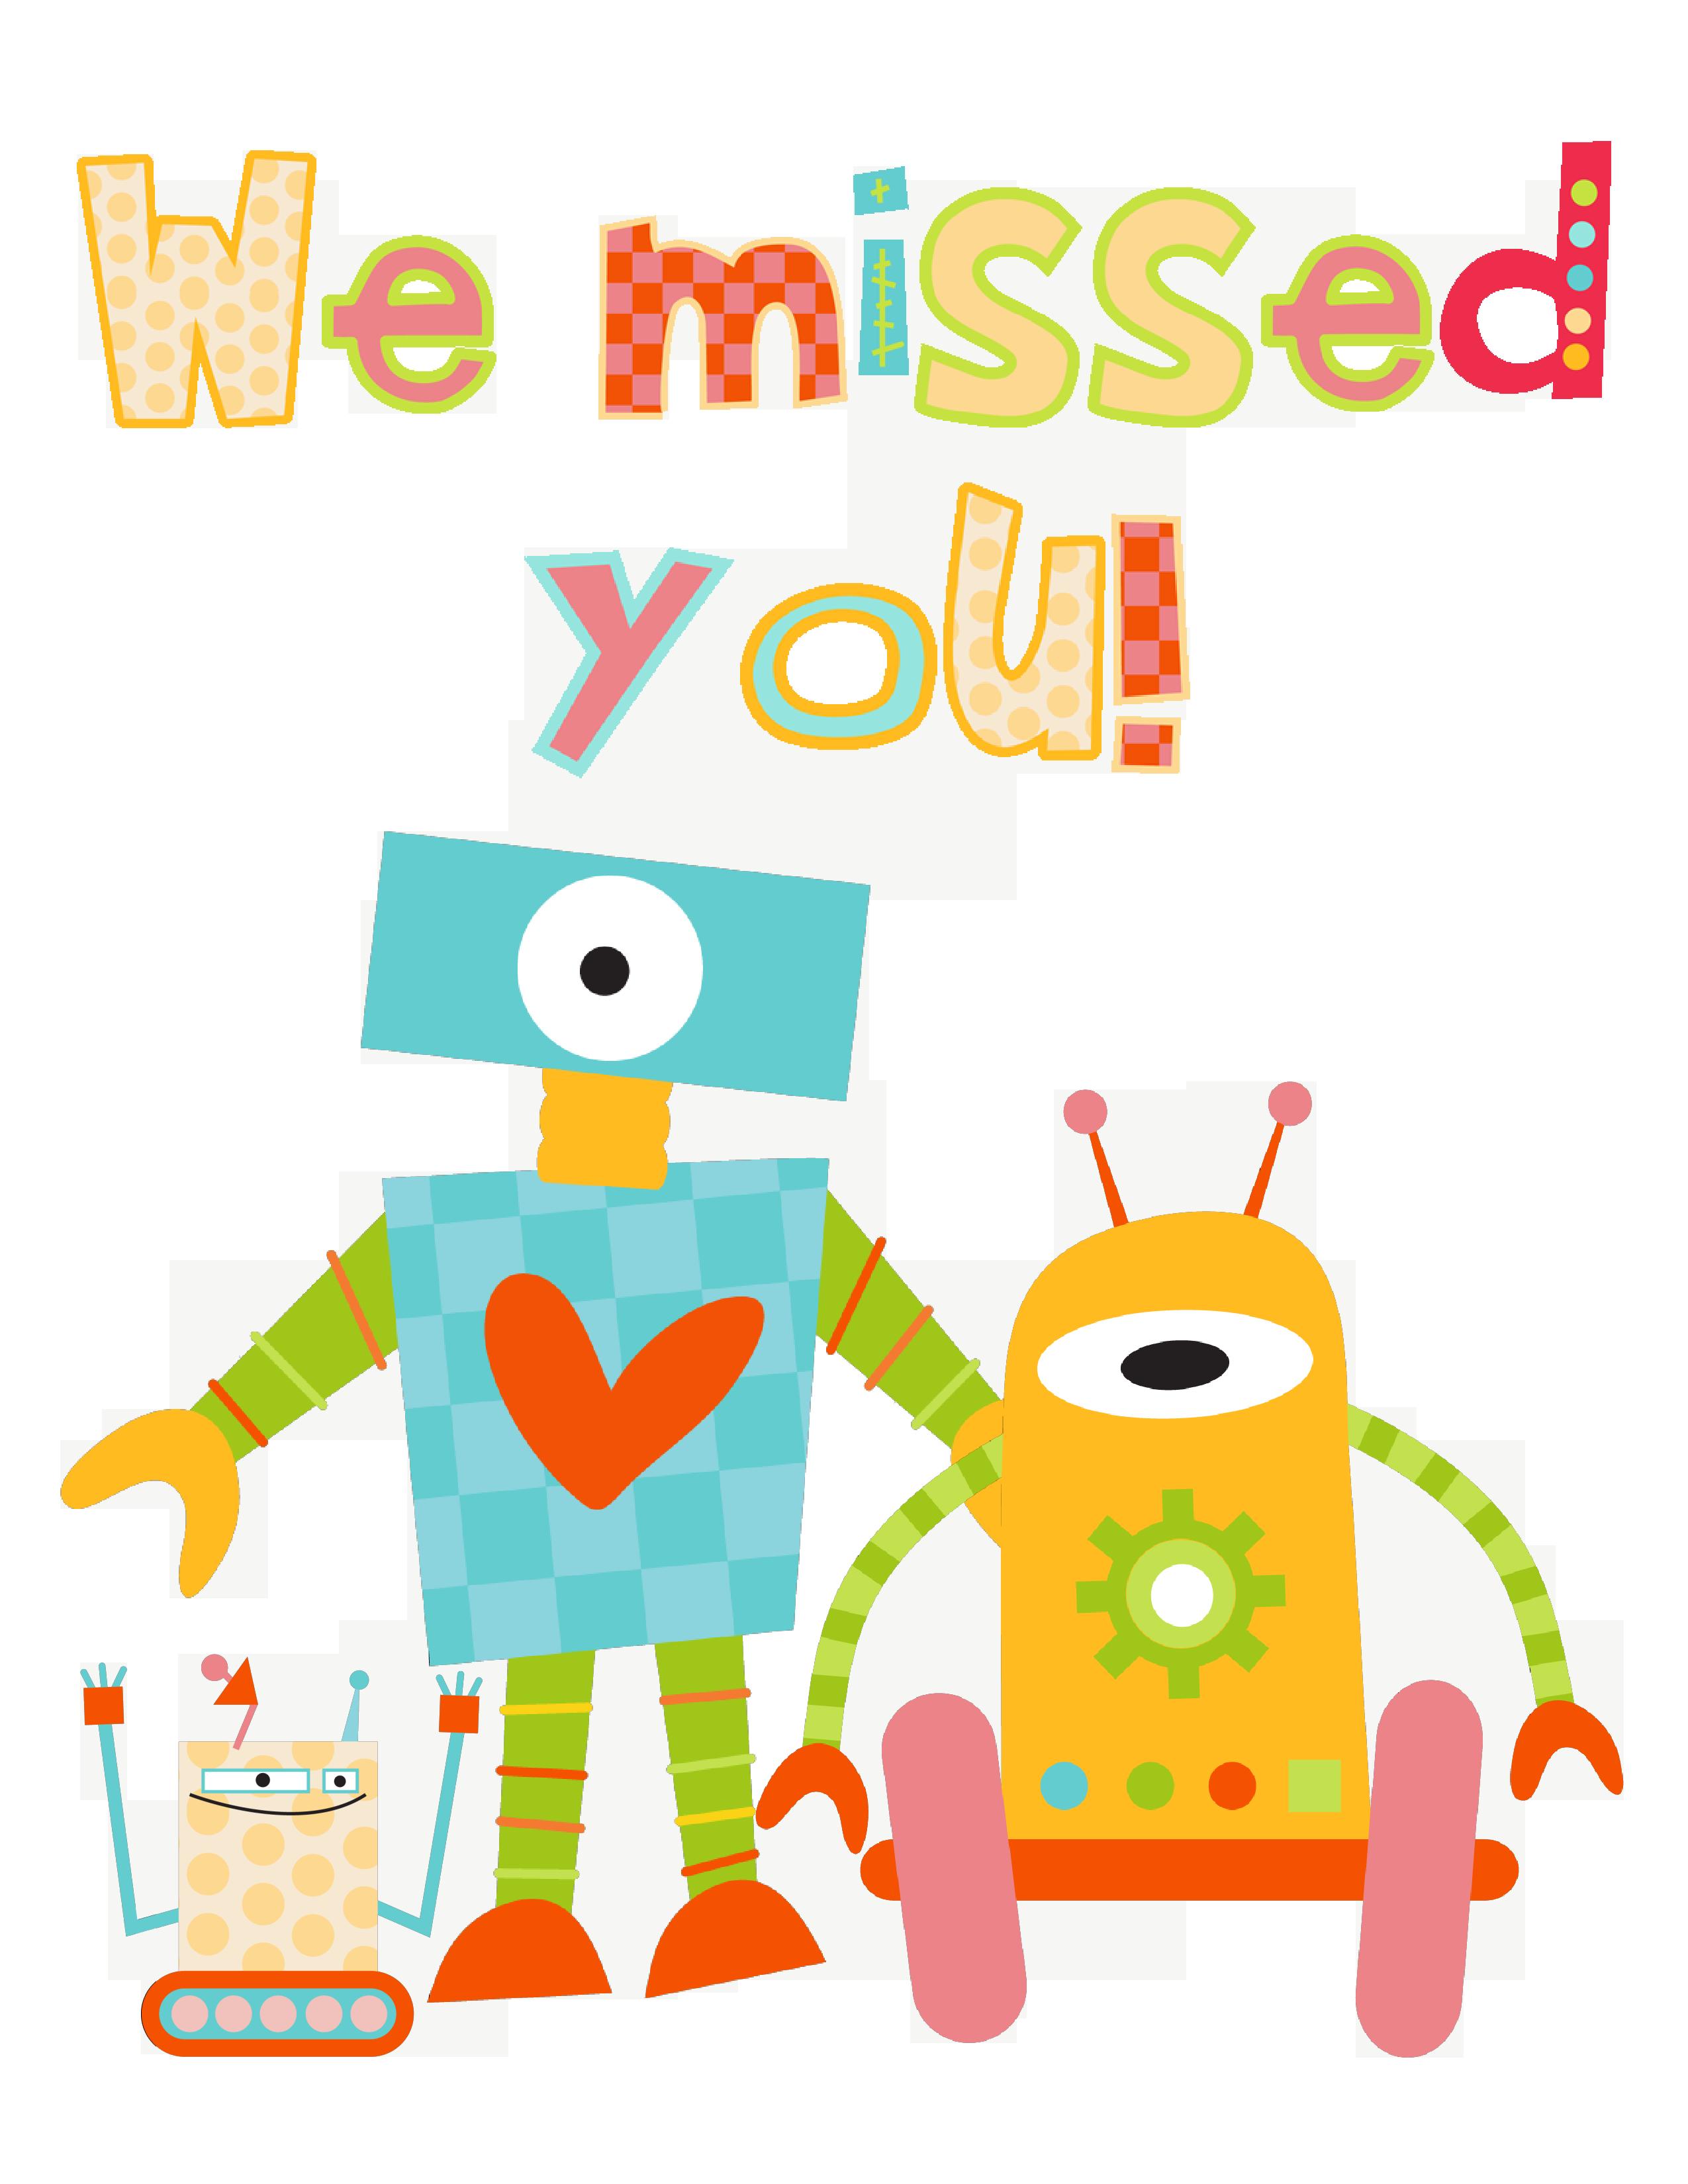 robots dibujos coloridos. Folder clipart absent work